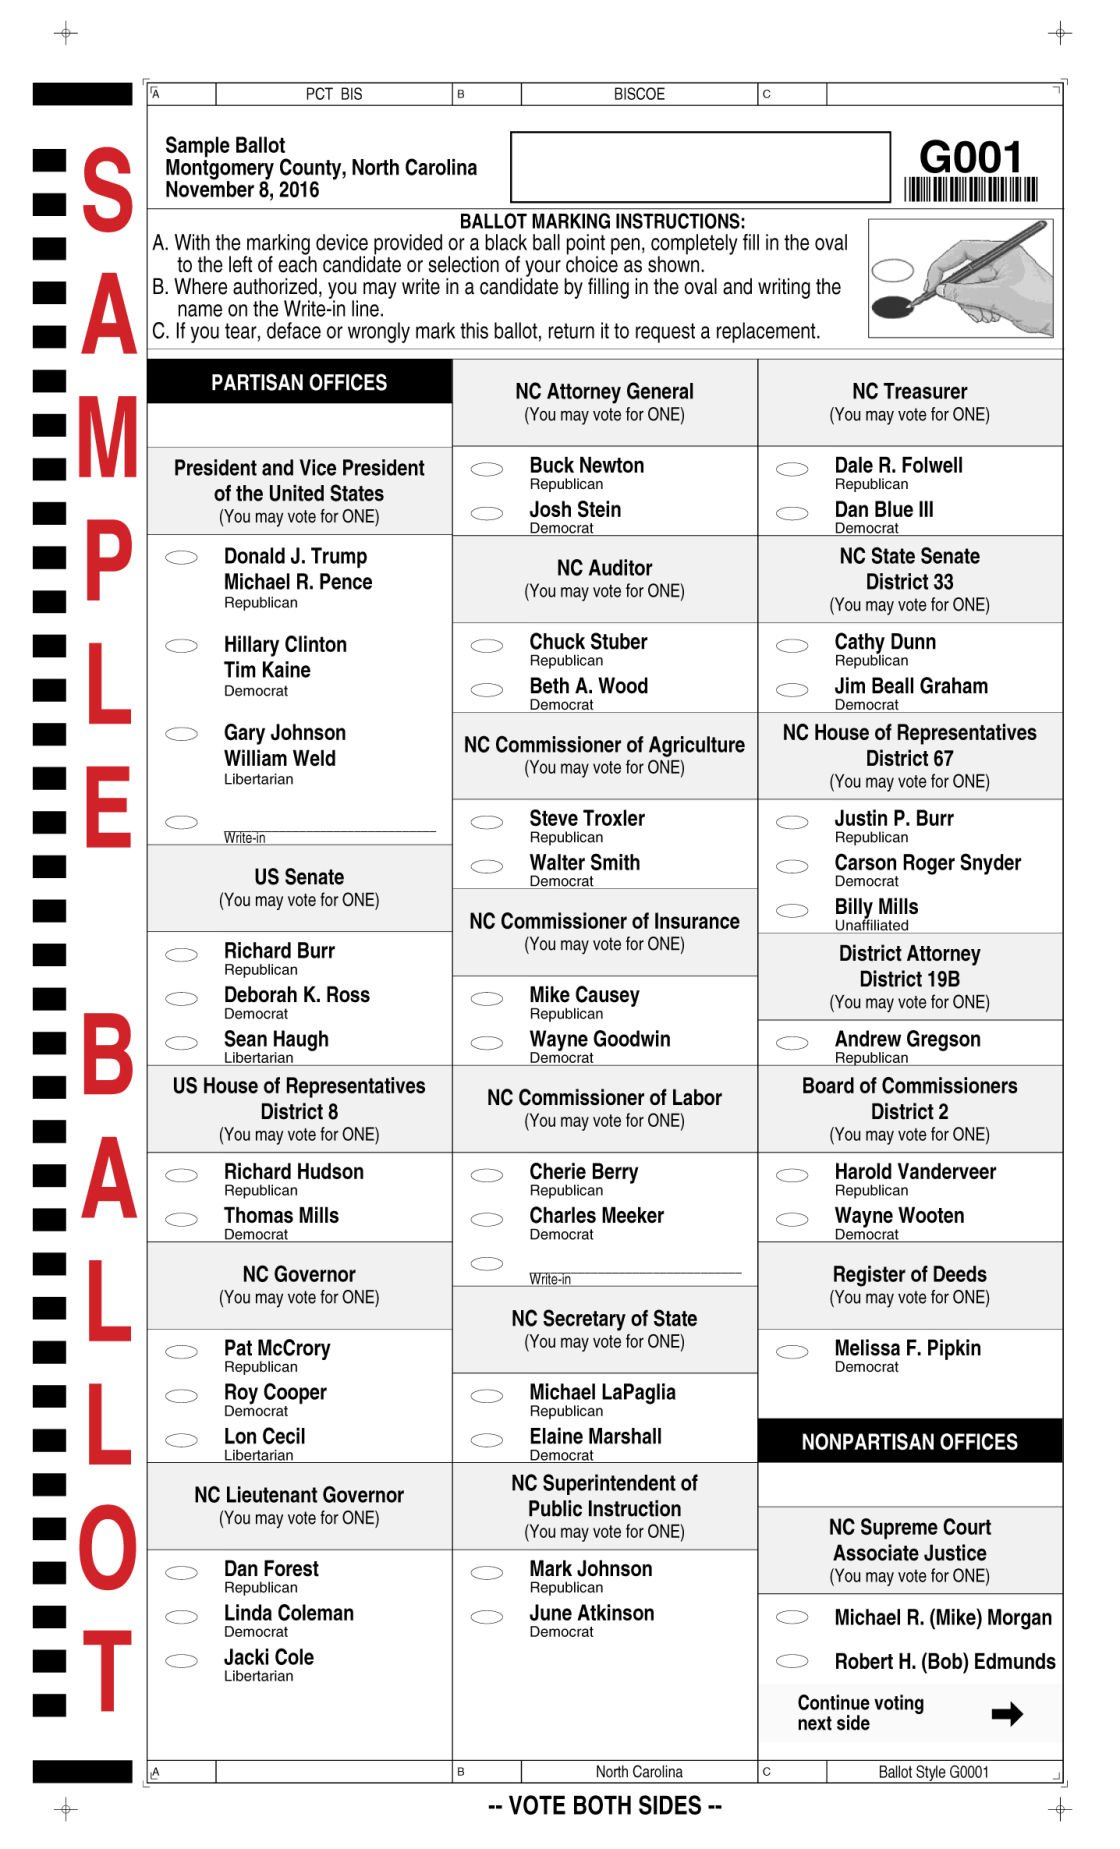 sample ballot for november 8th general election